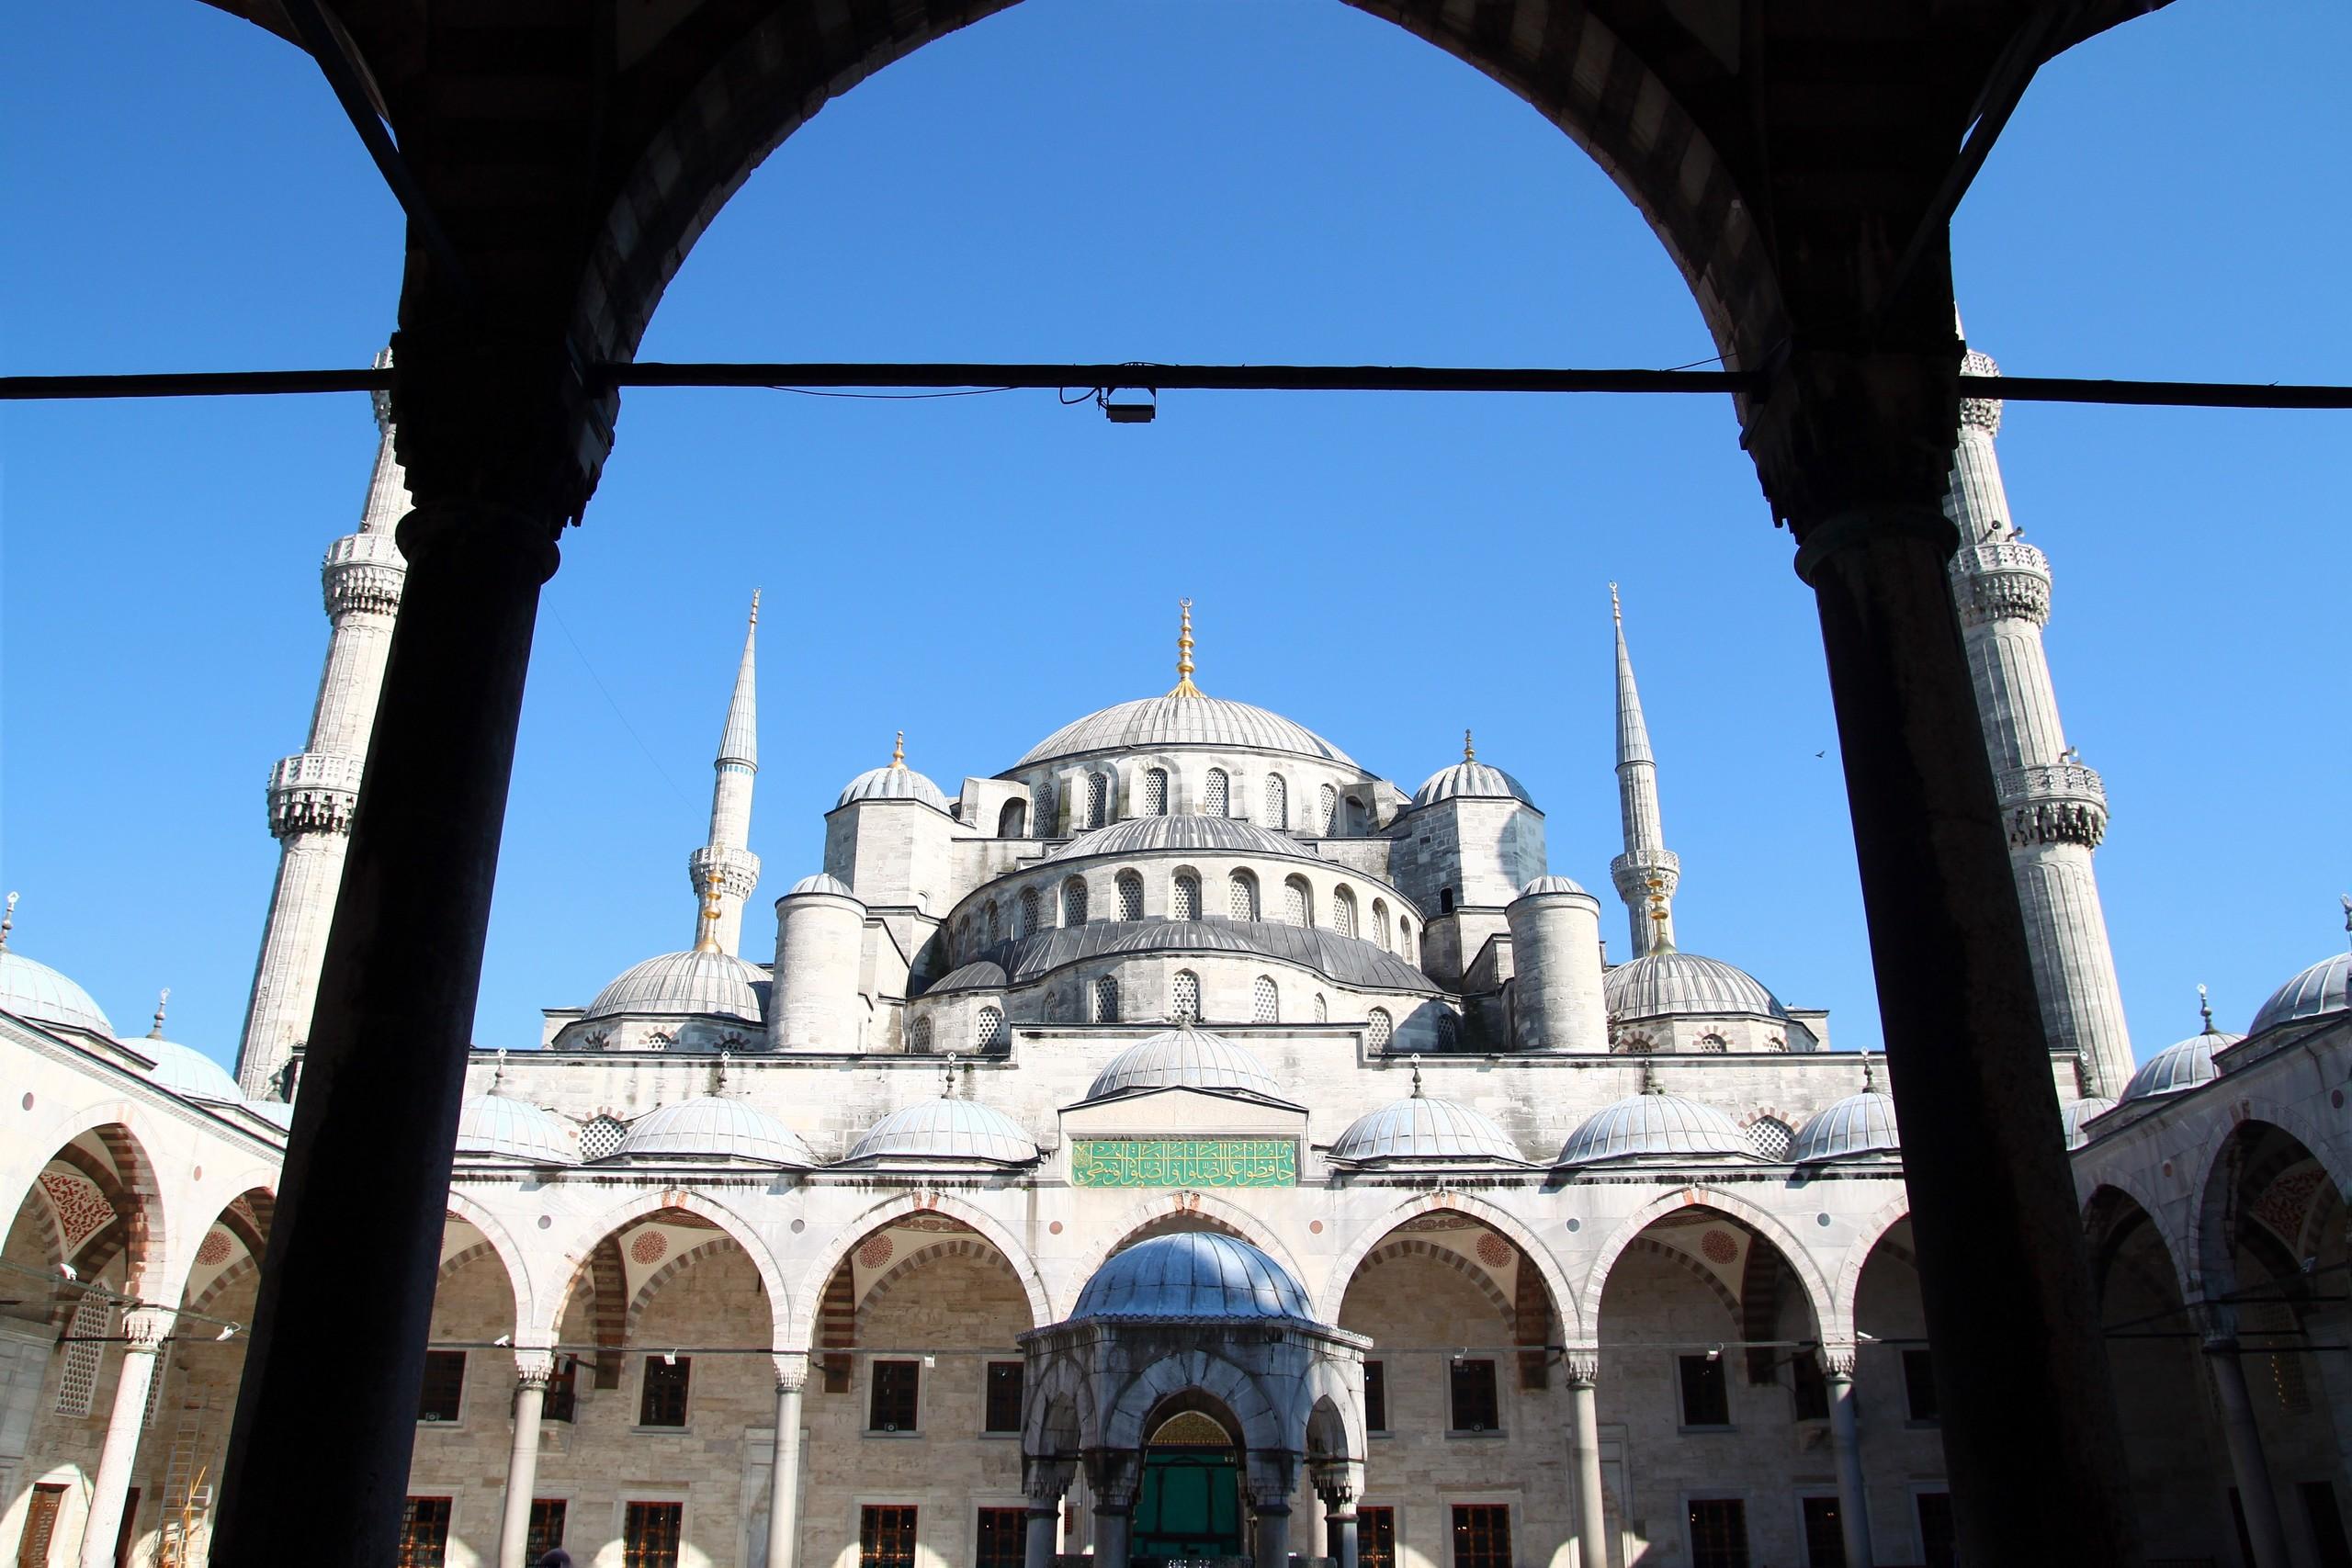 Pırlantadan Kubbeler #5: Sultanahmed - bbEXjG - Pırlantadan Kubbeler #5: Sultanahmed